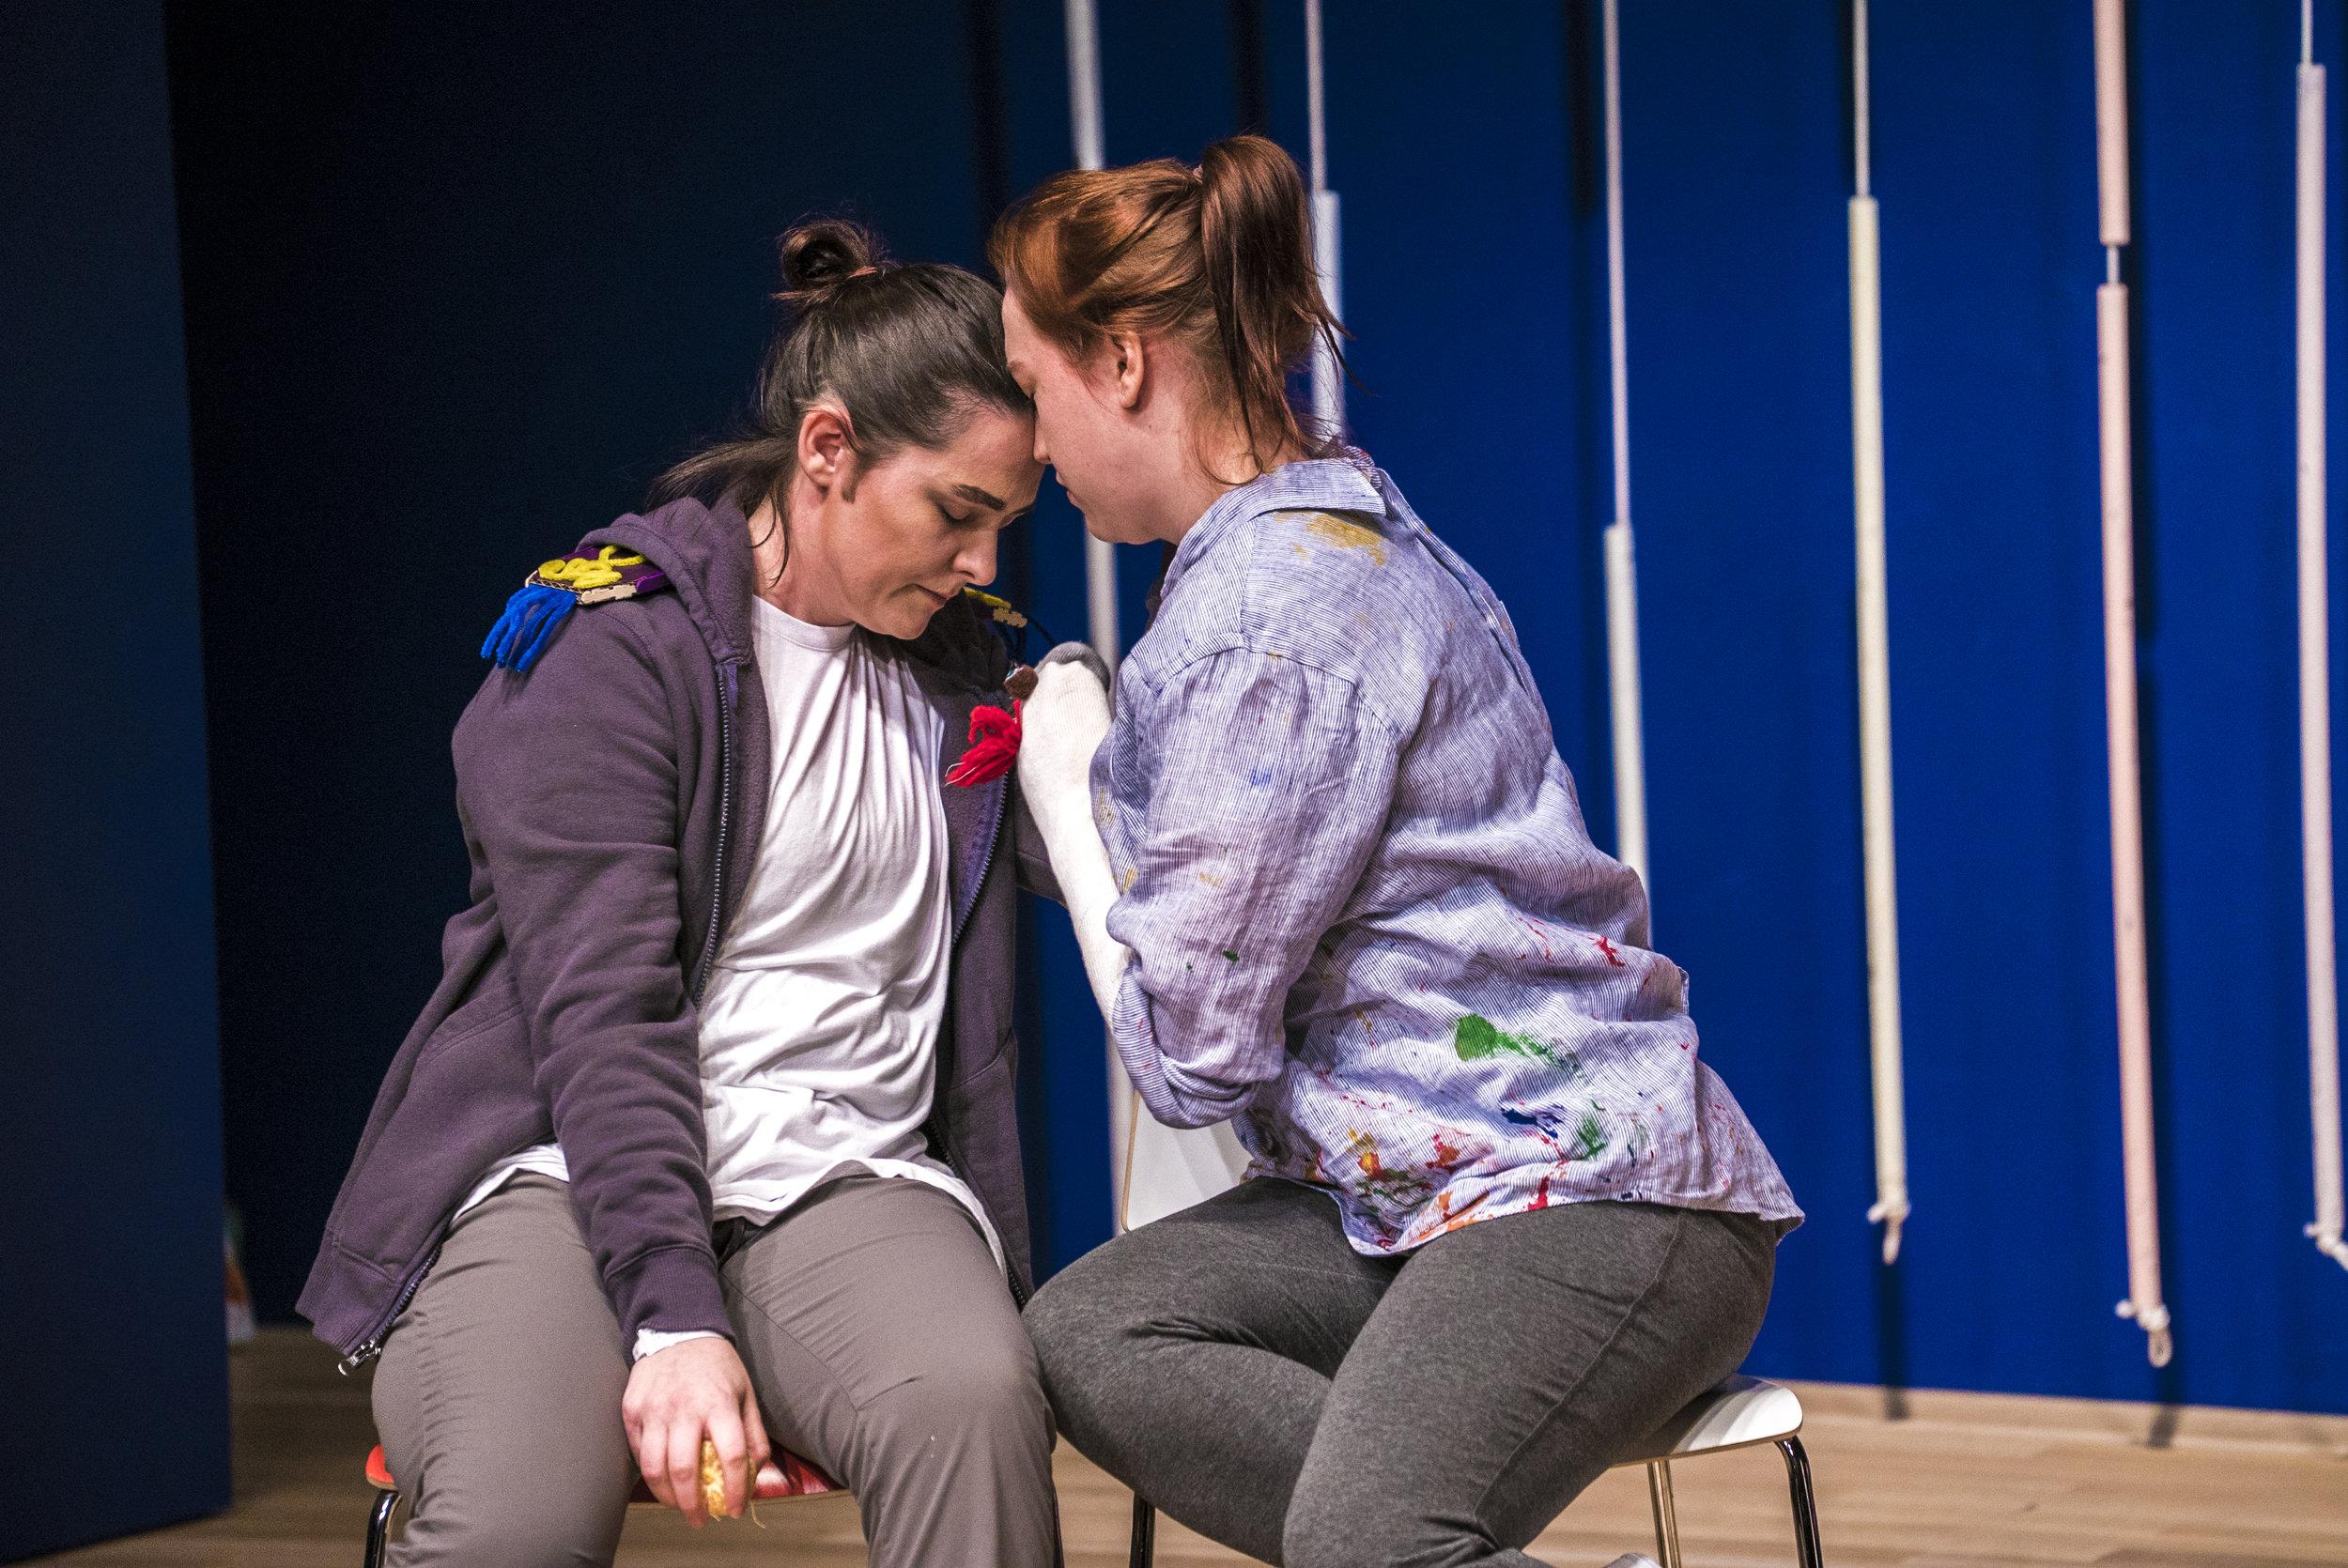 Laura Mitchell as Medoro and Lydia Dahling as Dorinda in Orlando. Photo credit: Lucas Godlewski